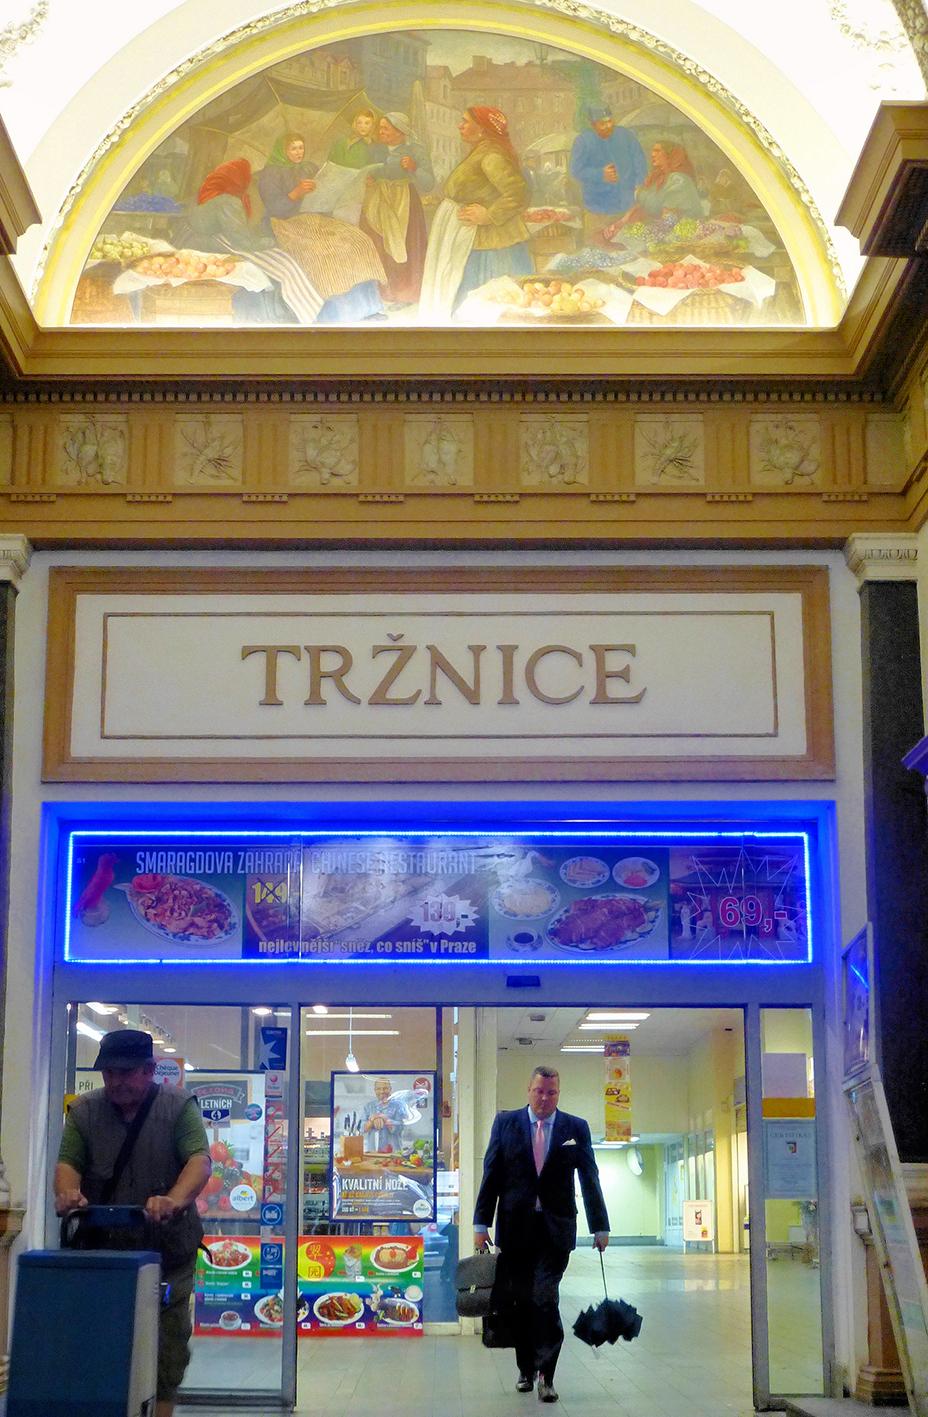 4. Trznice Arcade